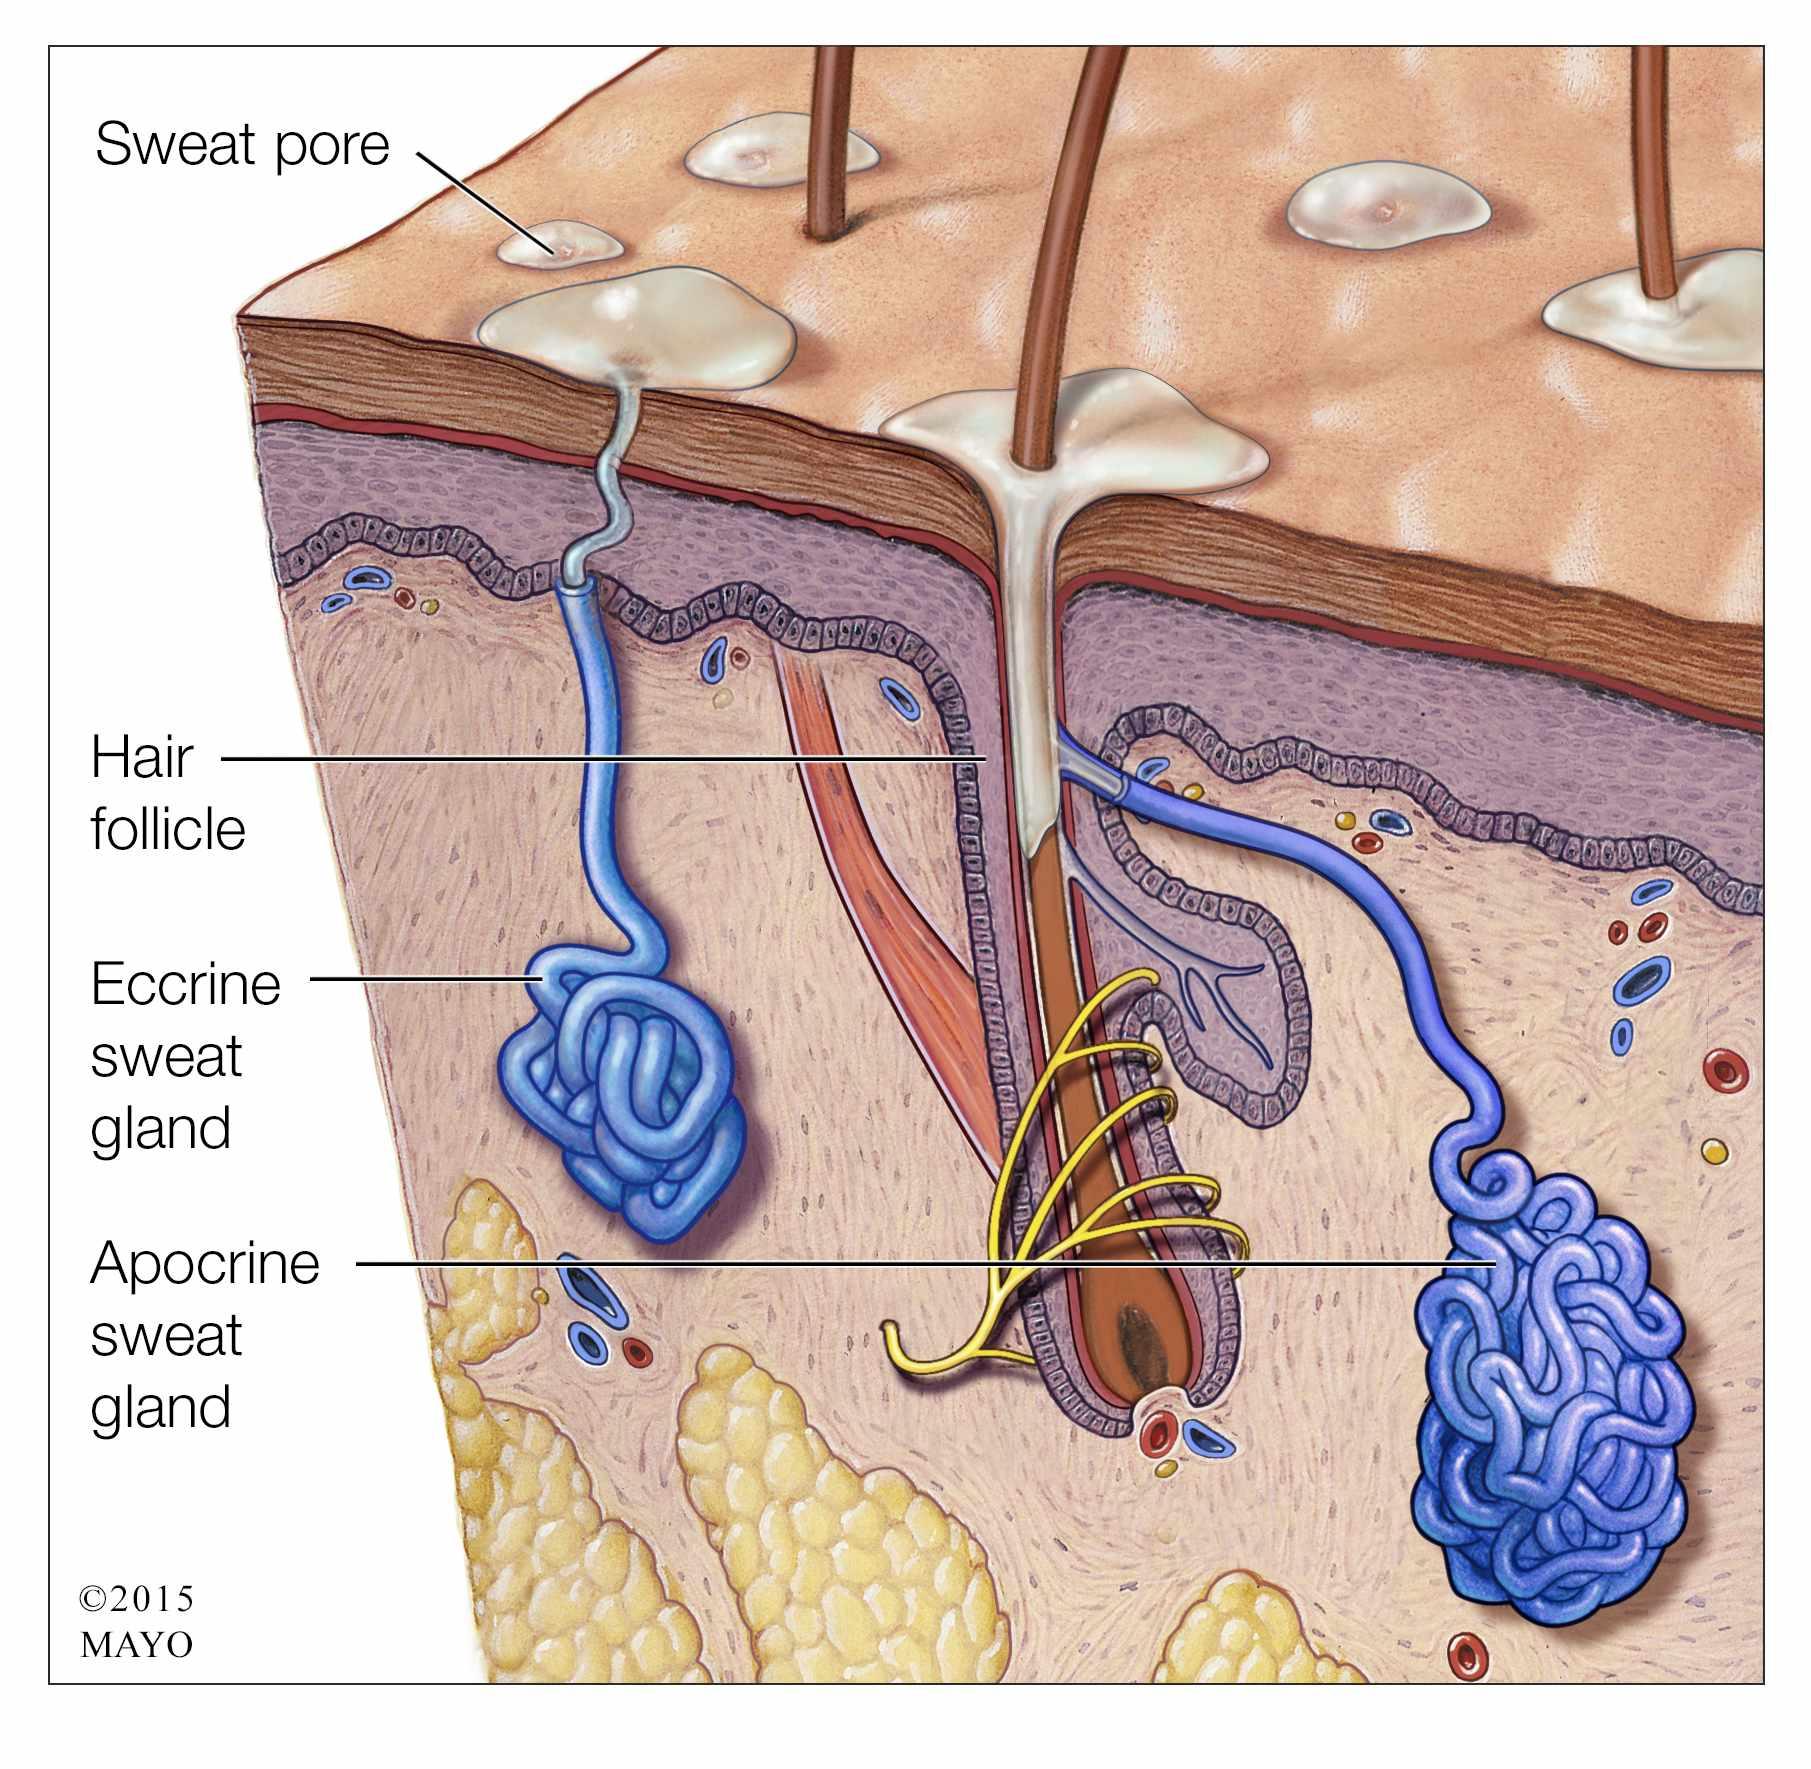 medical illustration of sweat pores, hair follicle, hyperhidrosis